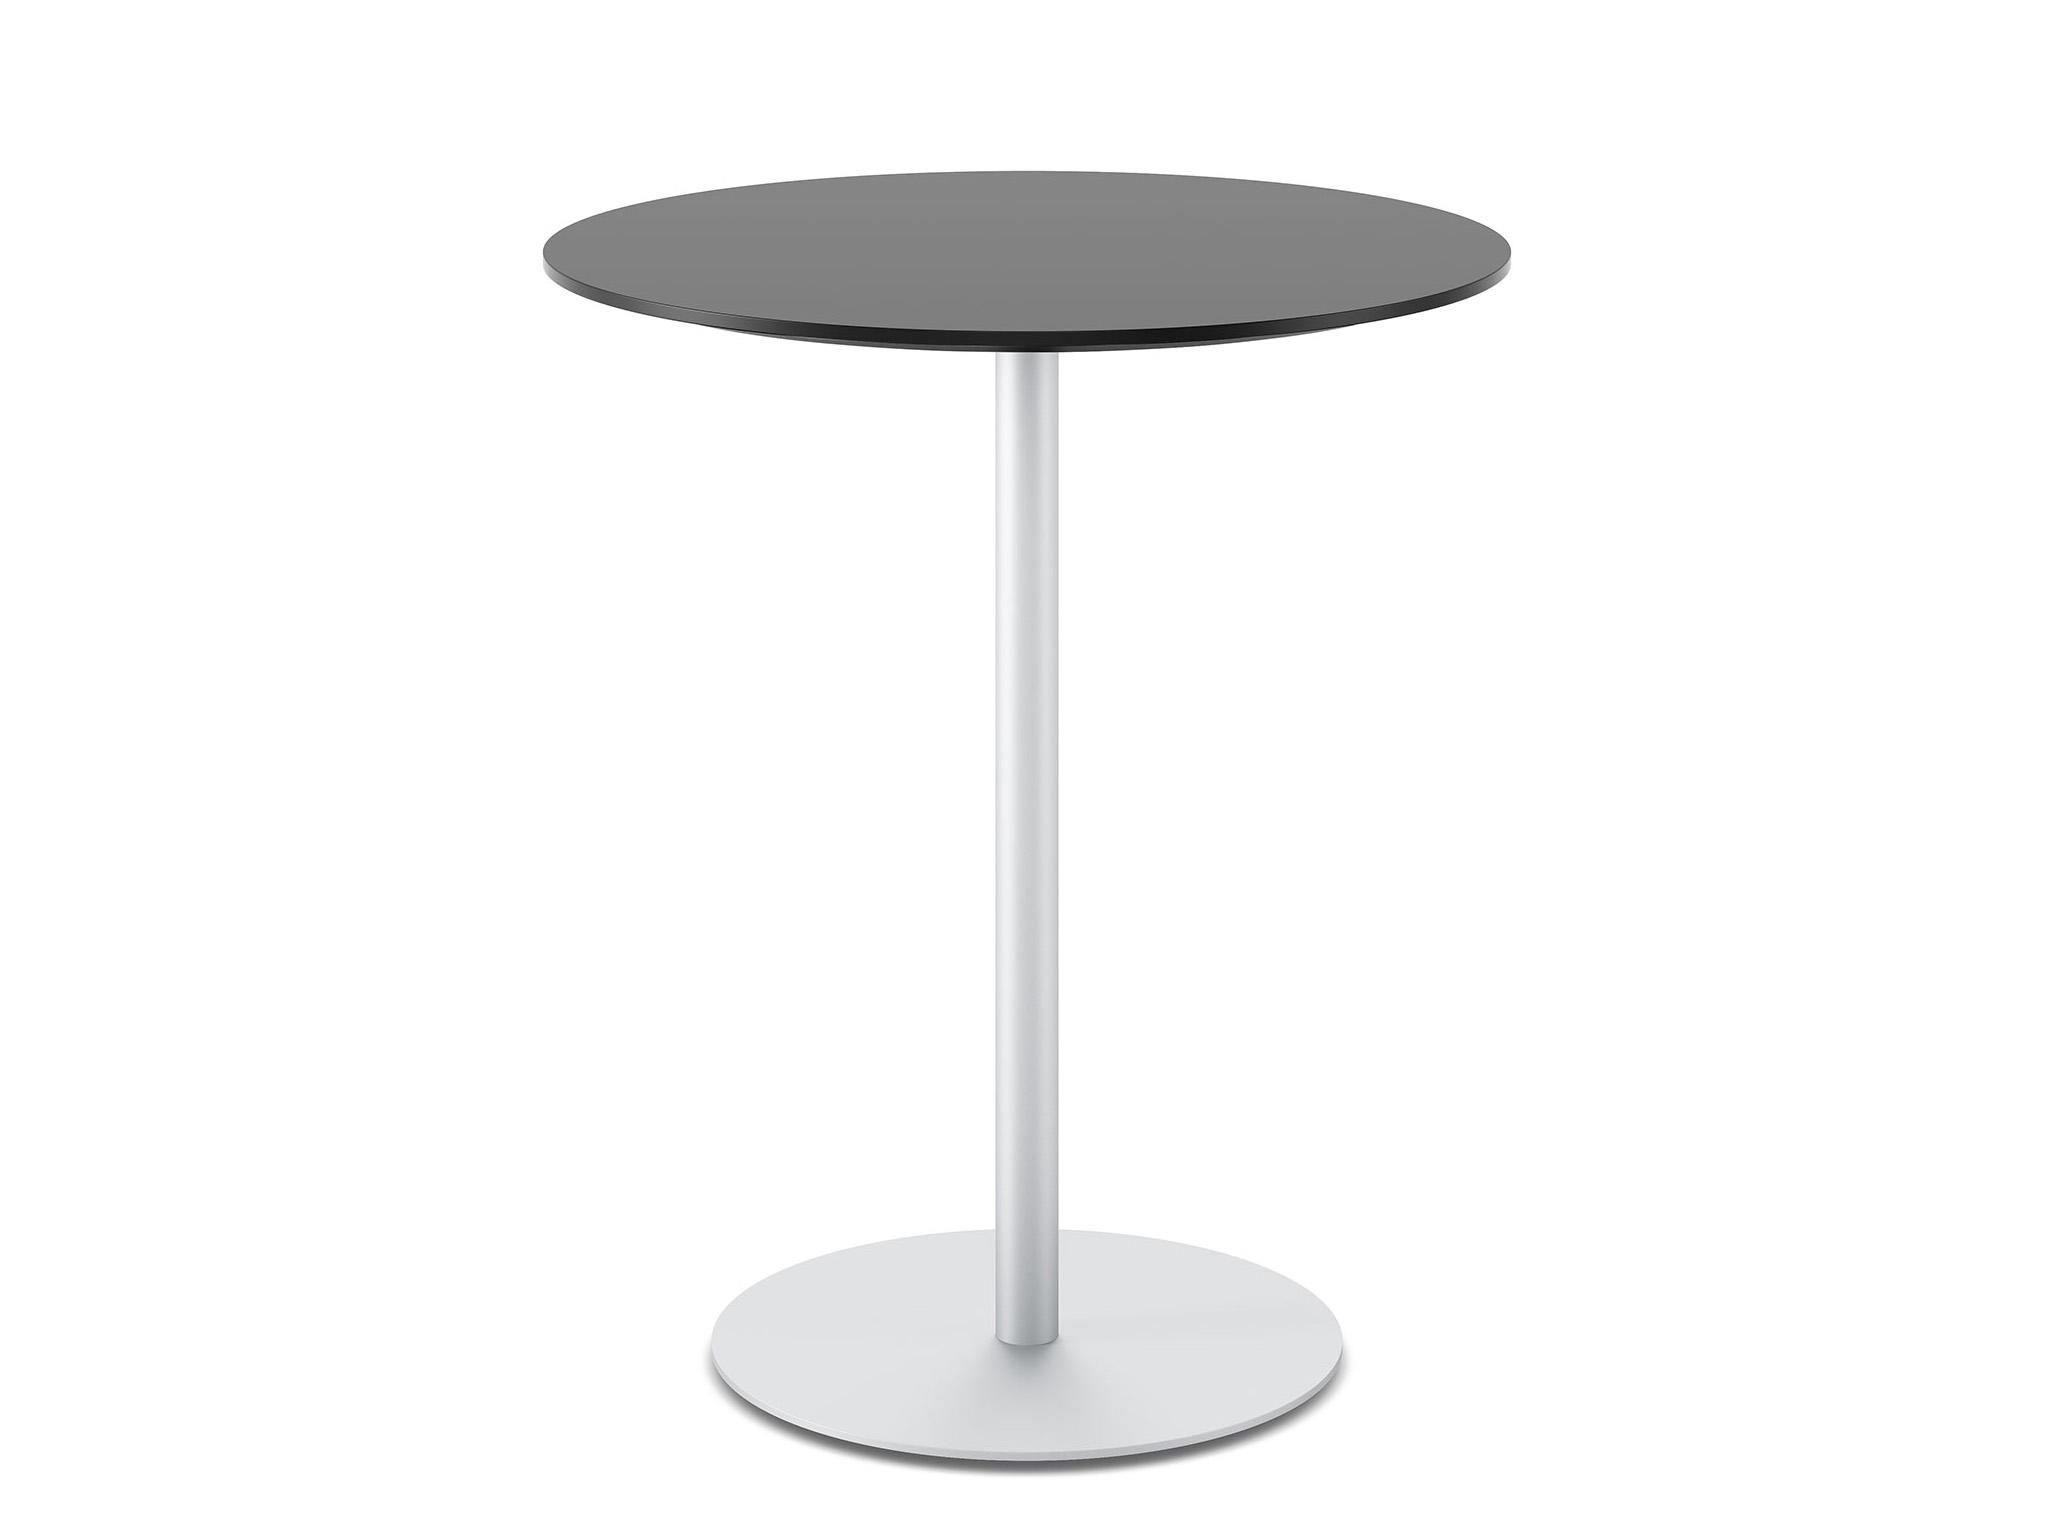 https://www.delightoffice.com/wp-content/uploads/2020/12/Montara650-Table_product-range2.jpg